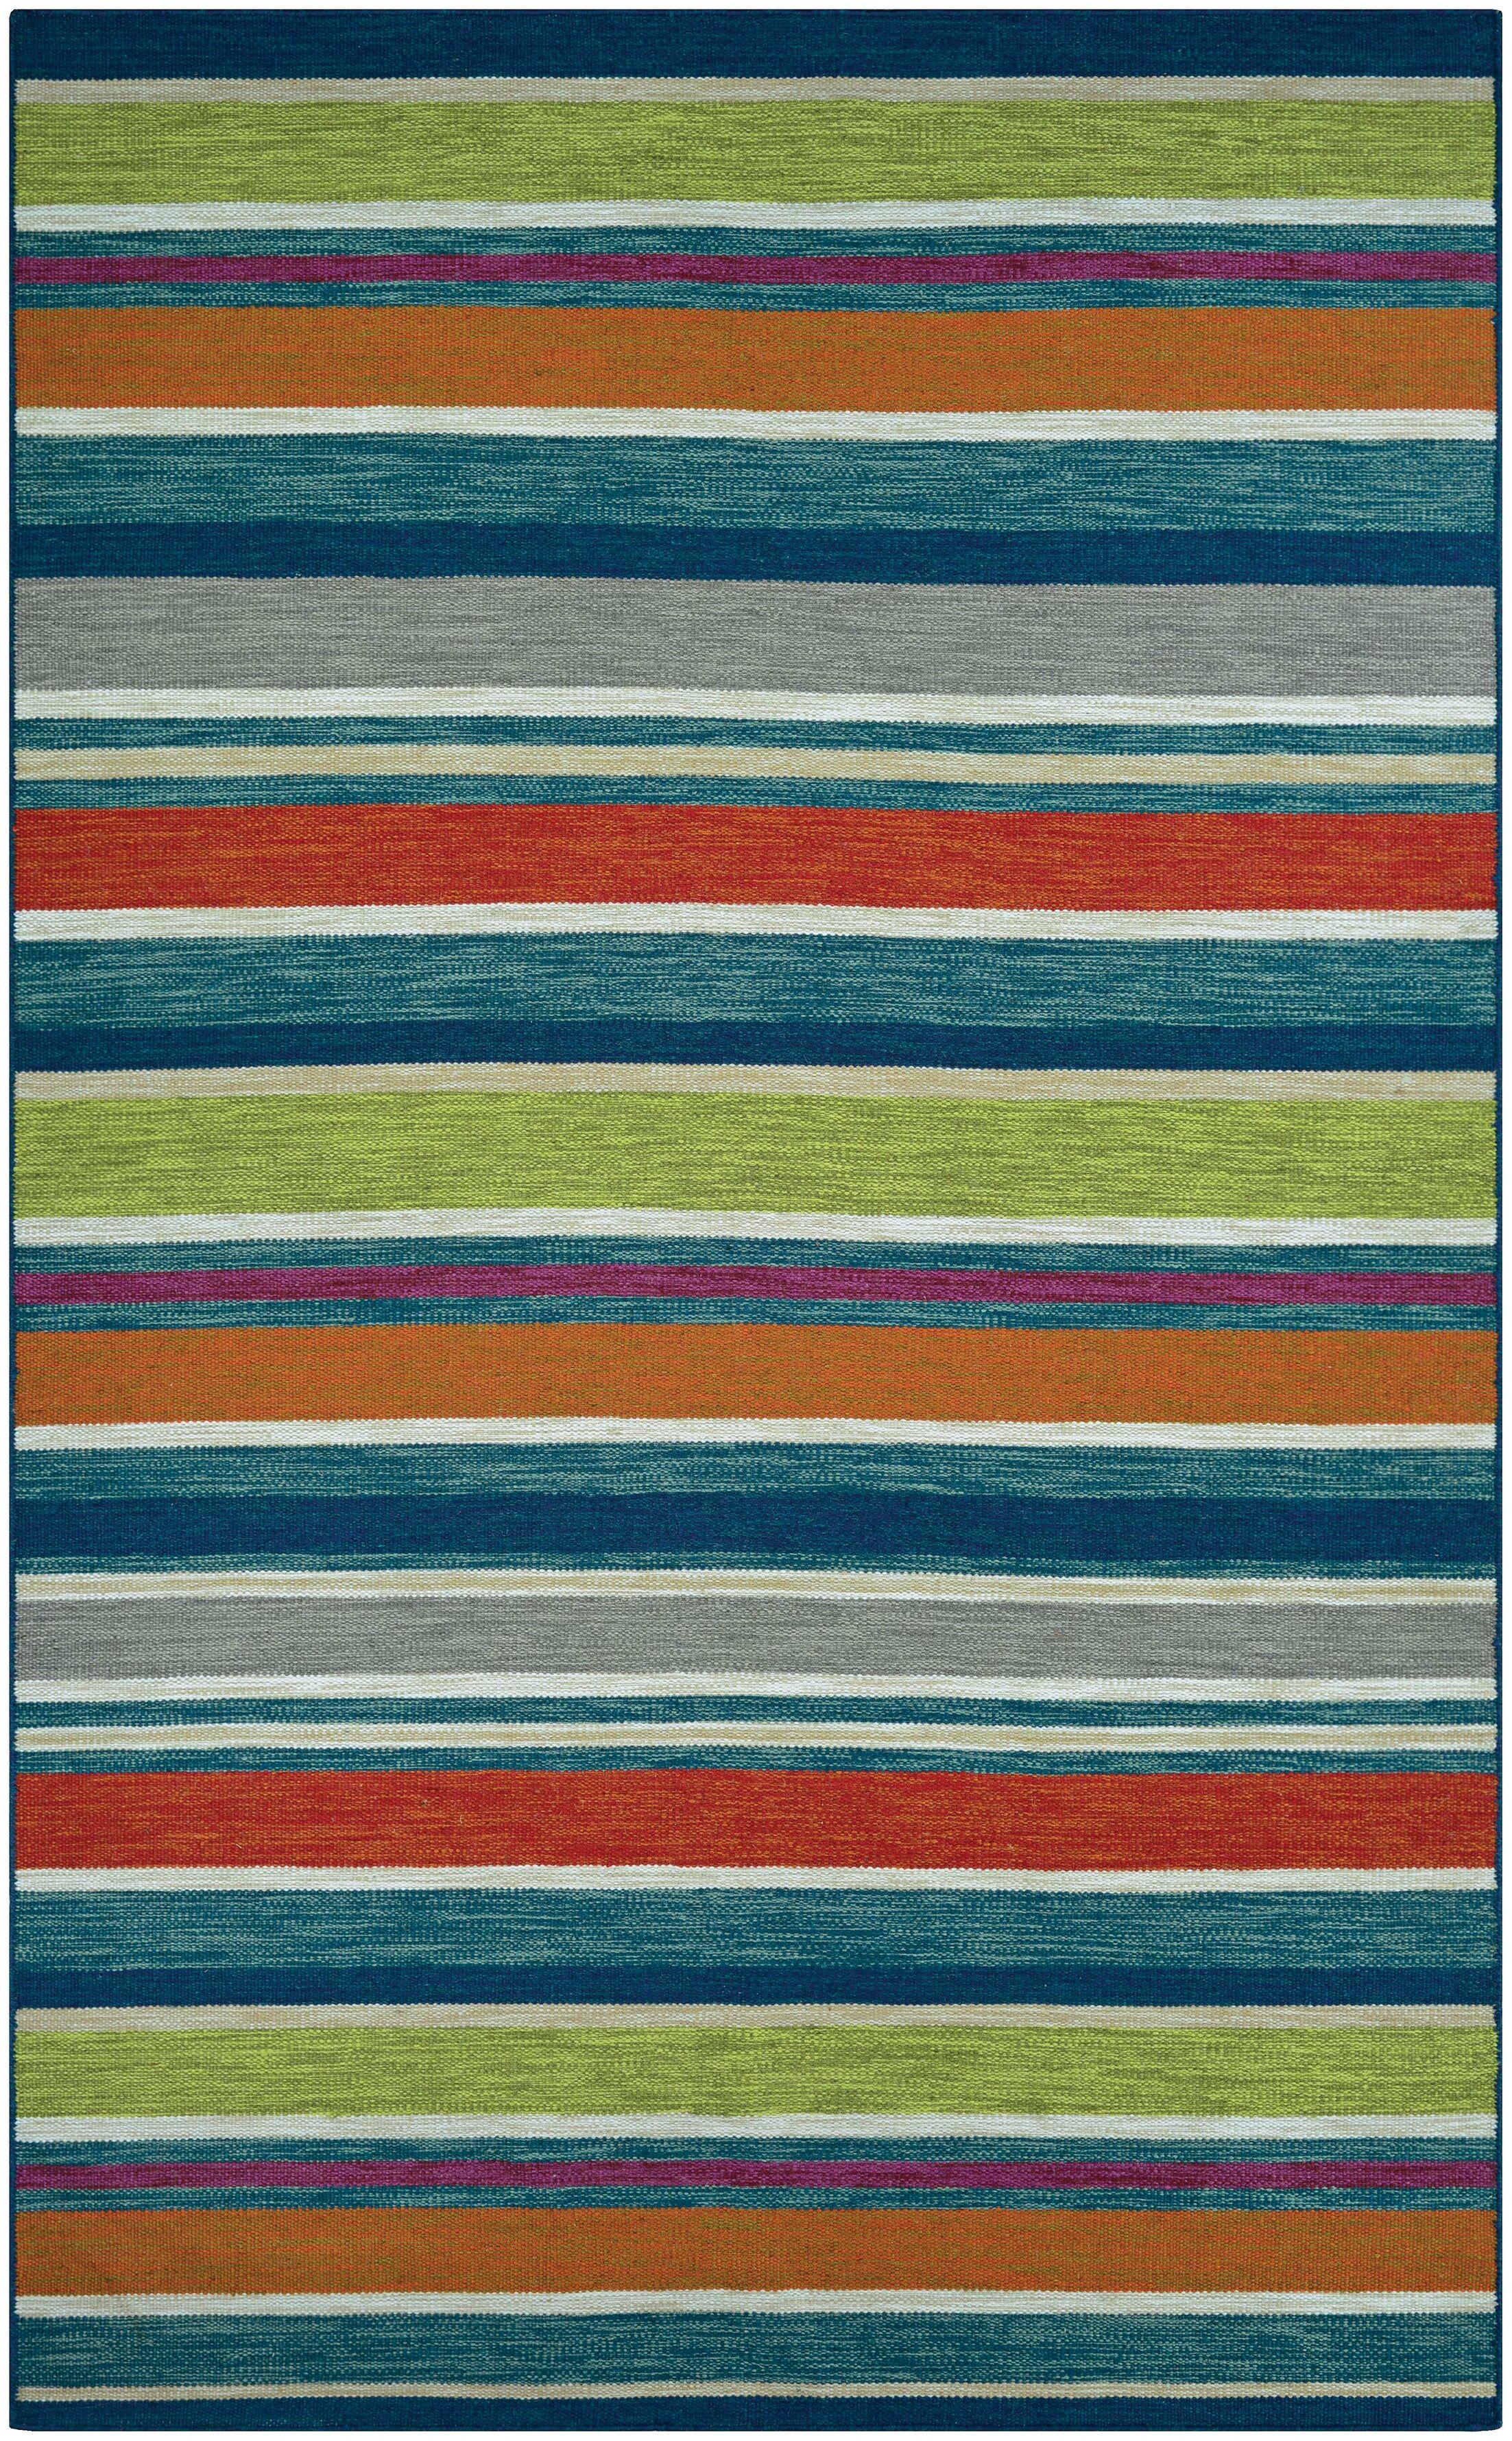 Cordero Hand-Woven Indoor/Outdoor Area Rug Rug Size: Rectangle 8' x 10'